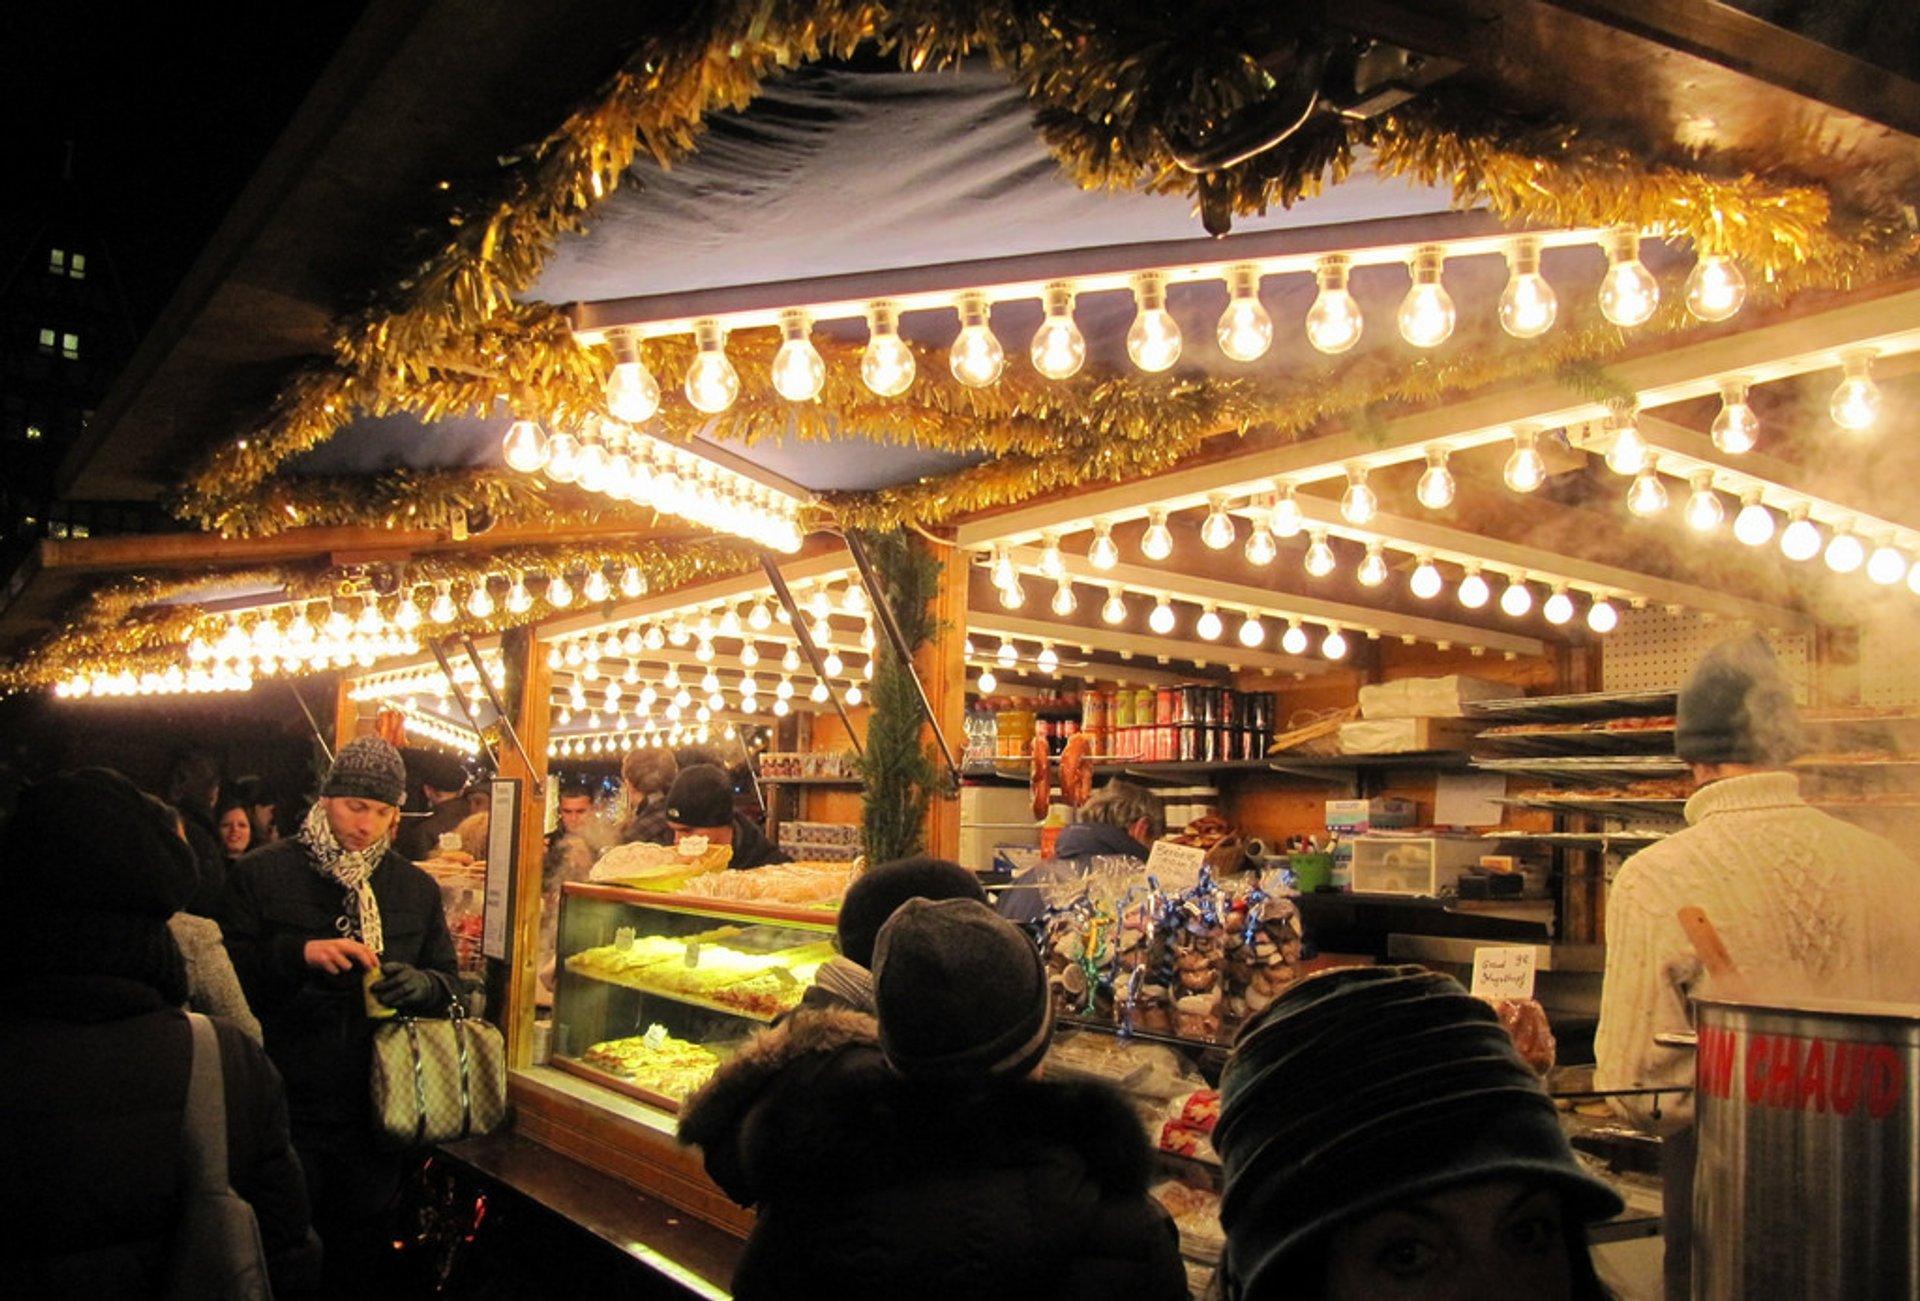 Strasbourg Christmas market 2020